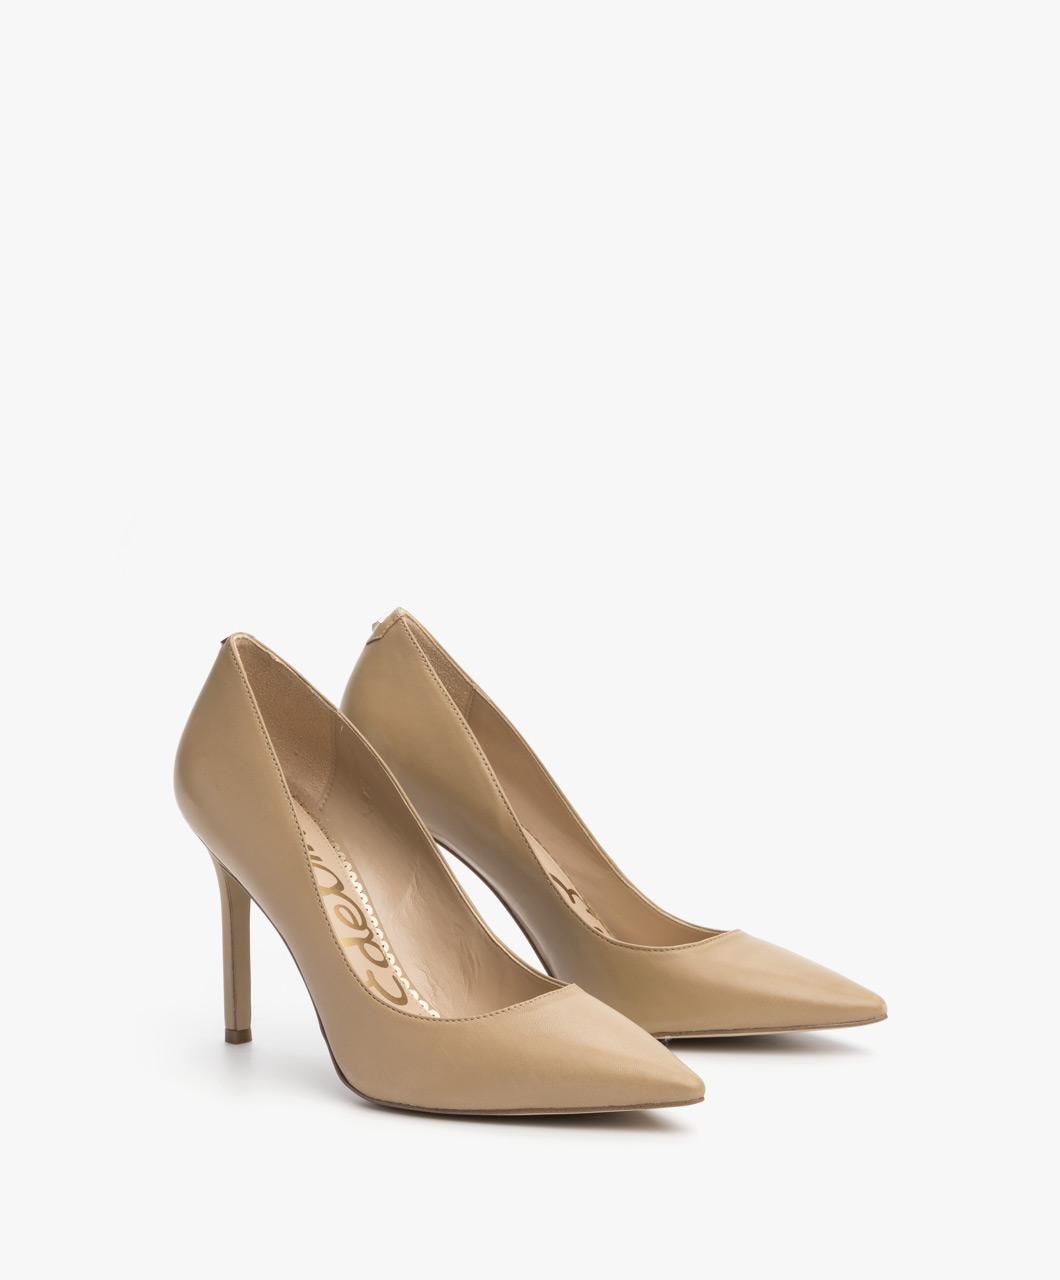 bc1932d52c3 Sam Edelman Hazel Leather Heels - Nude Classic - hazel e5638lj254 ...